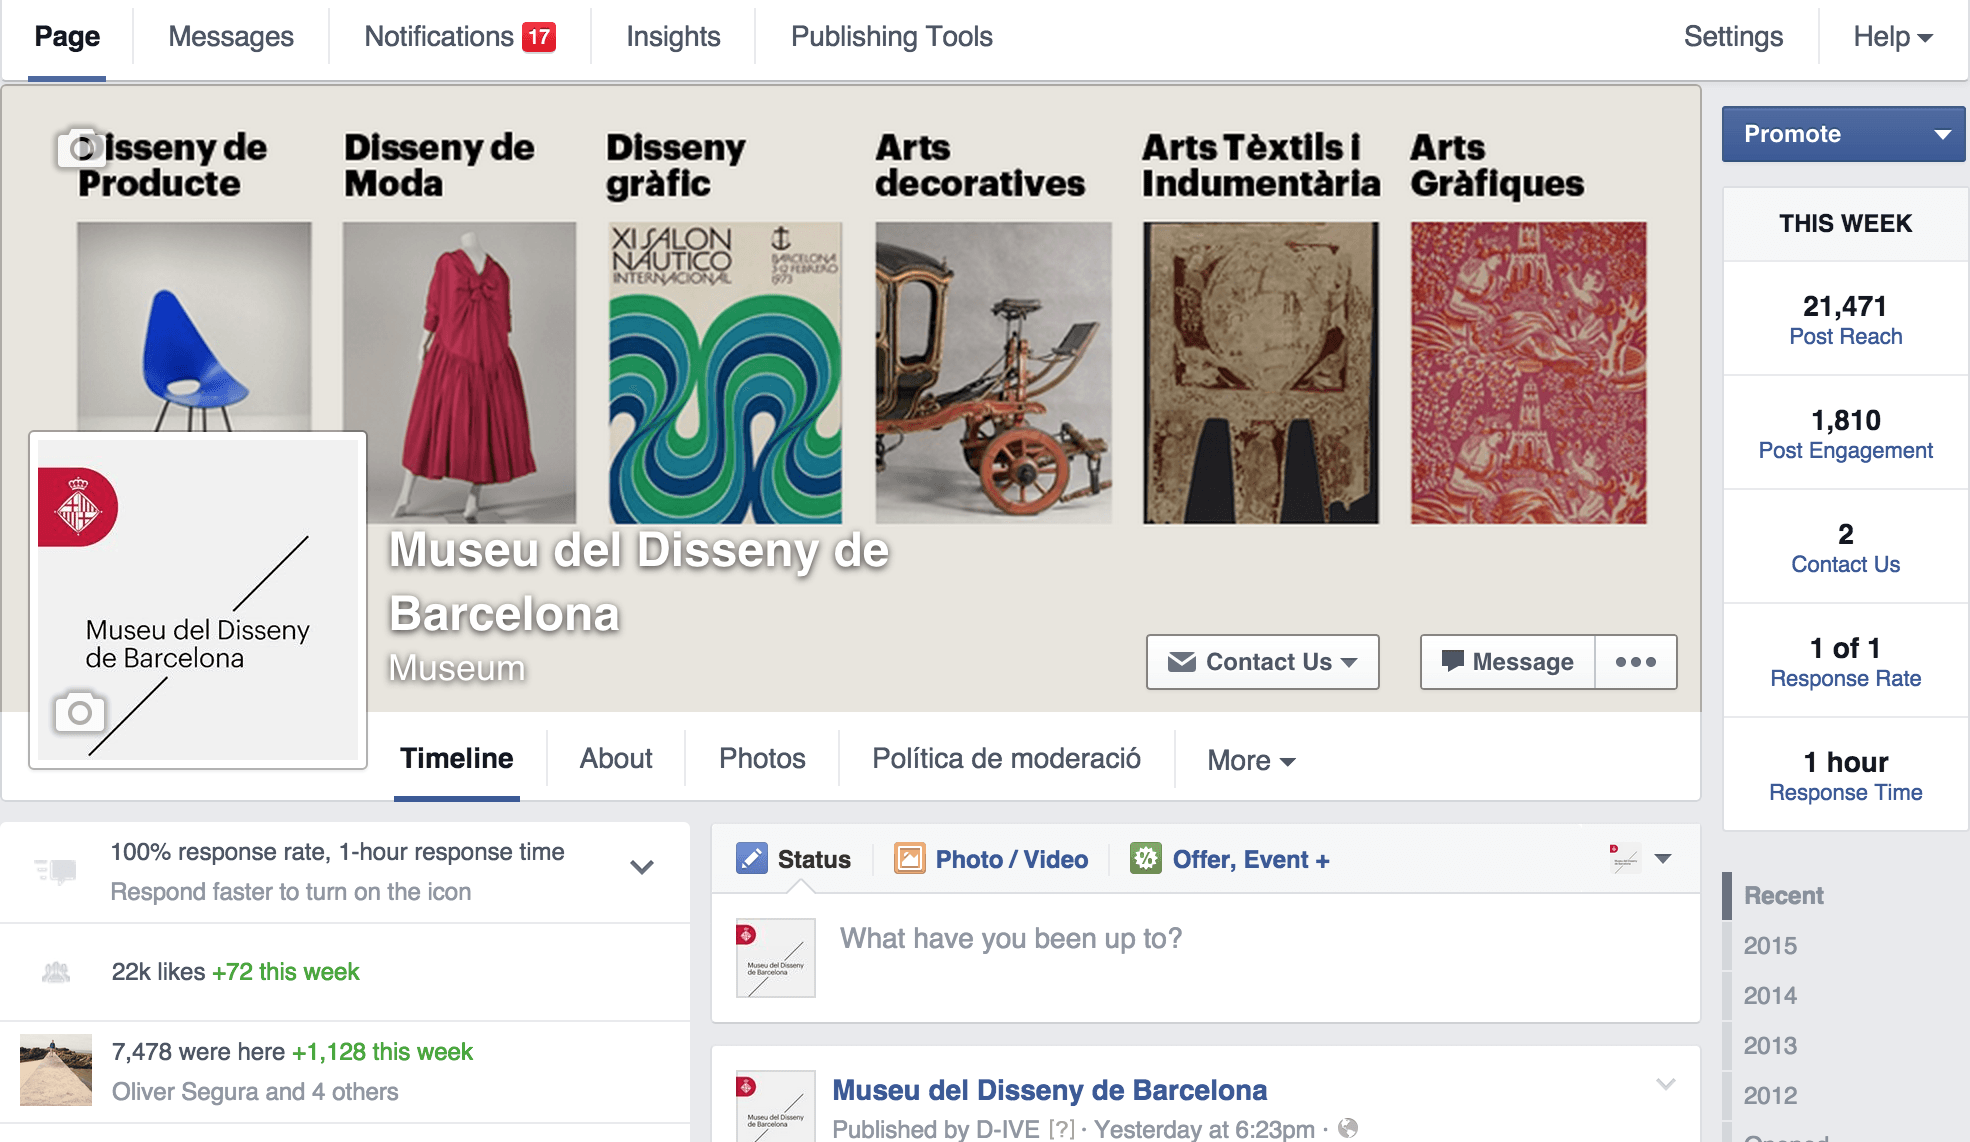 facebookmuseudisseny